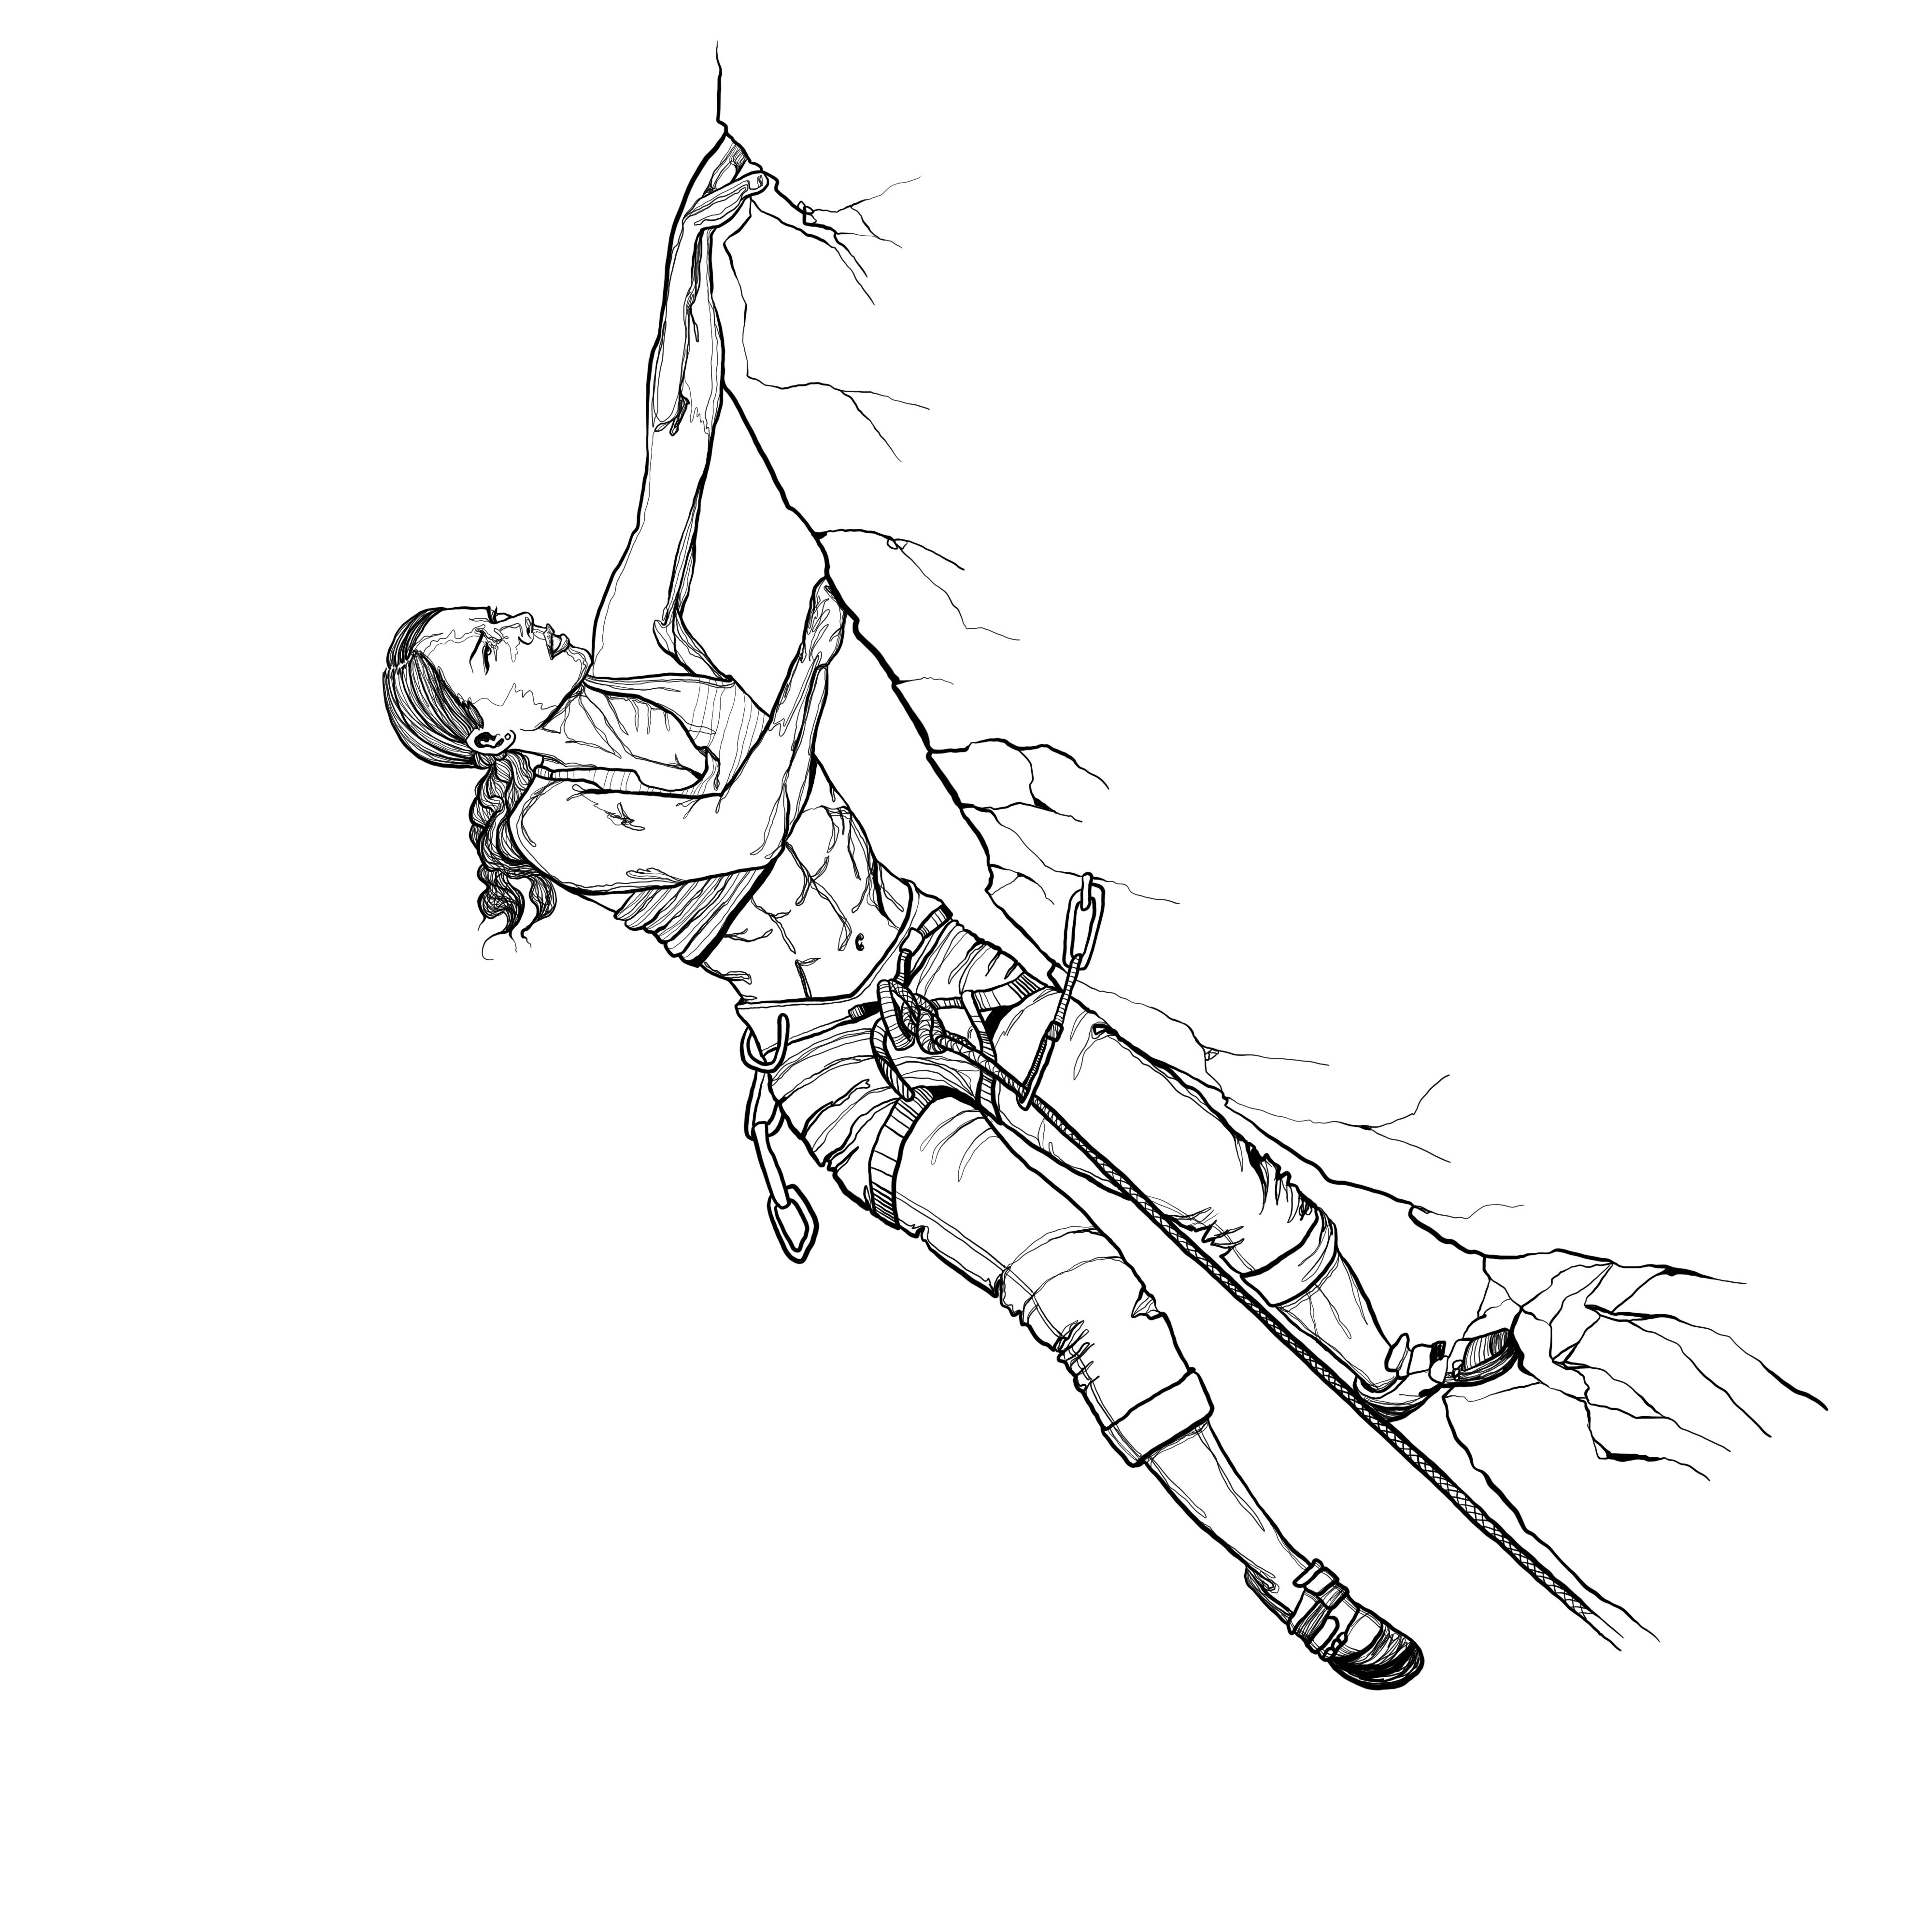 Pen Illustration - Female Rock Climber